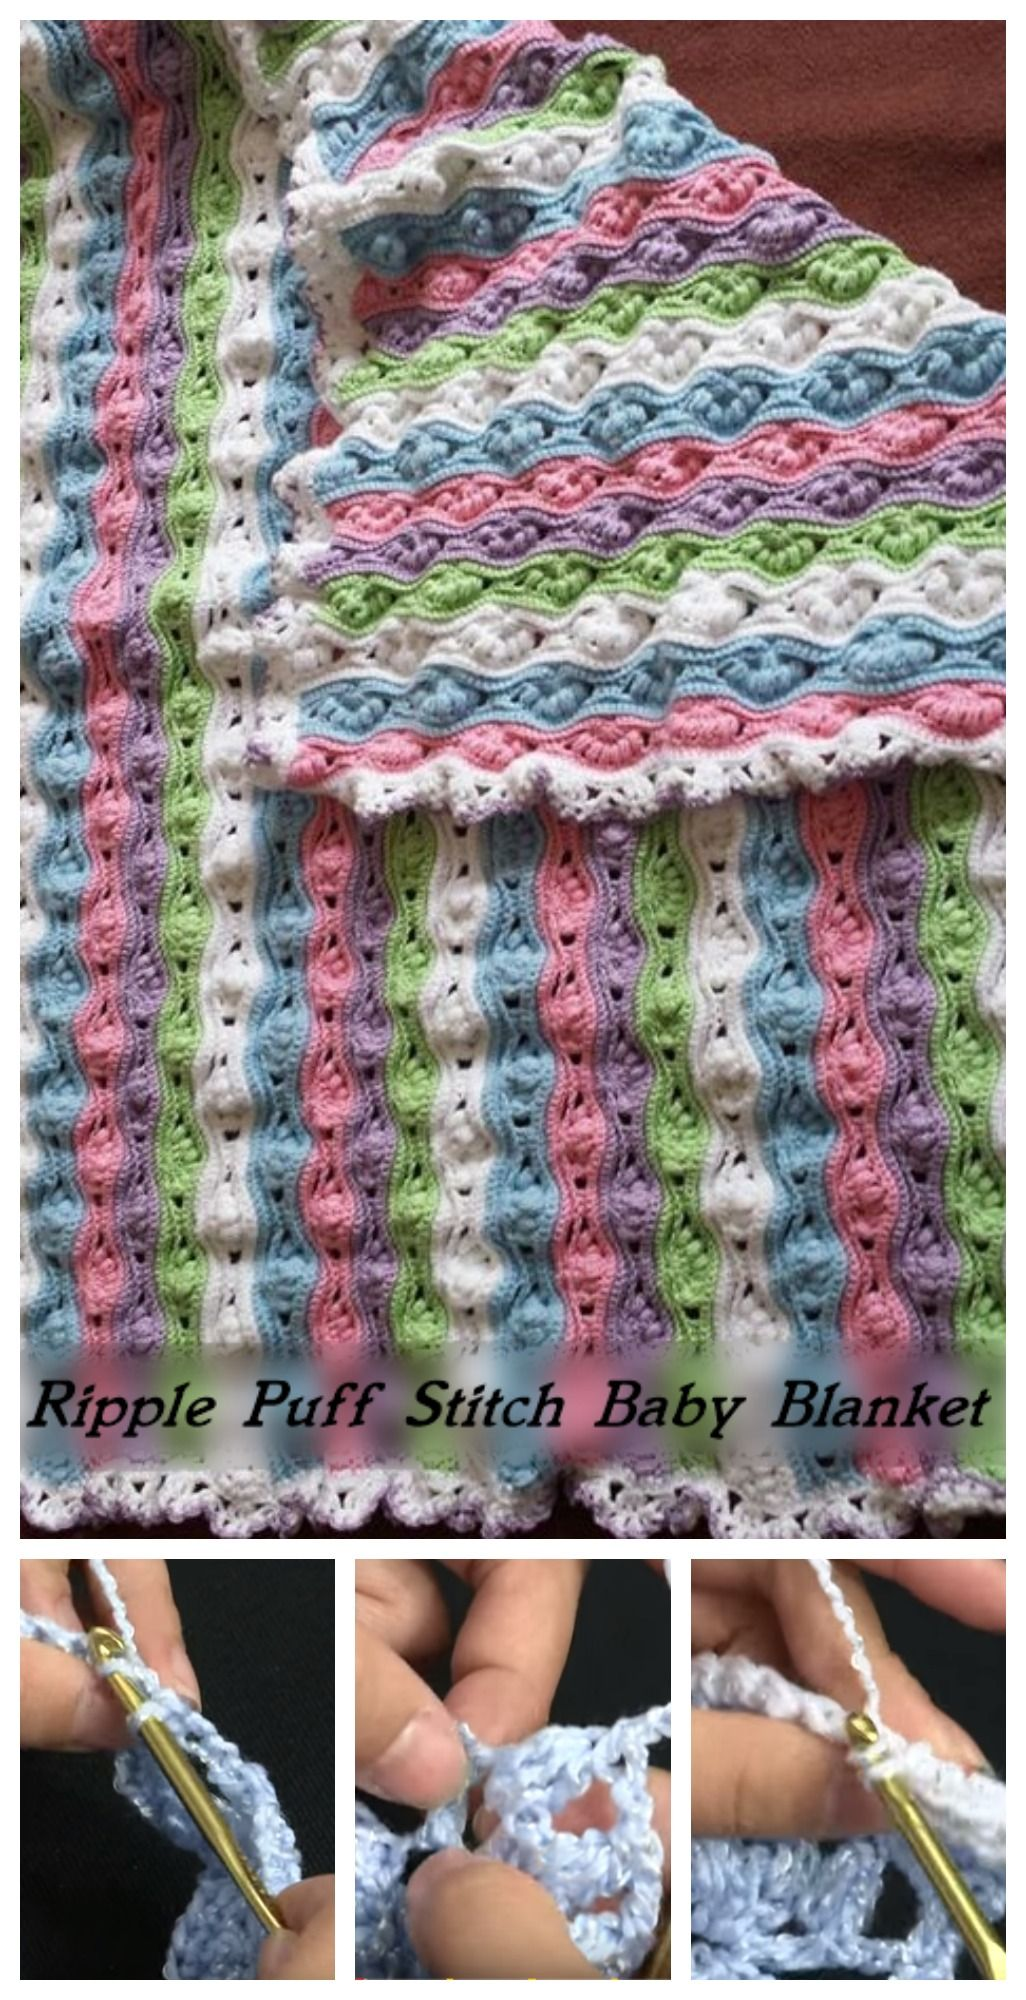 Crochet Ripple Puff Stitch Baby Blanket   Cobija, Puntadas y Manta